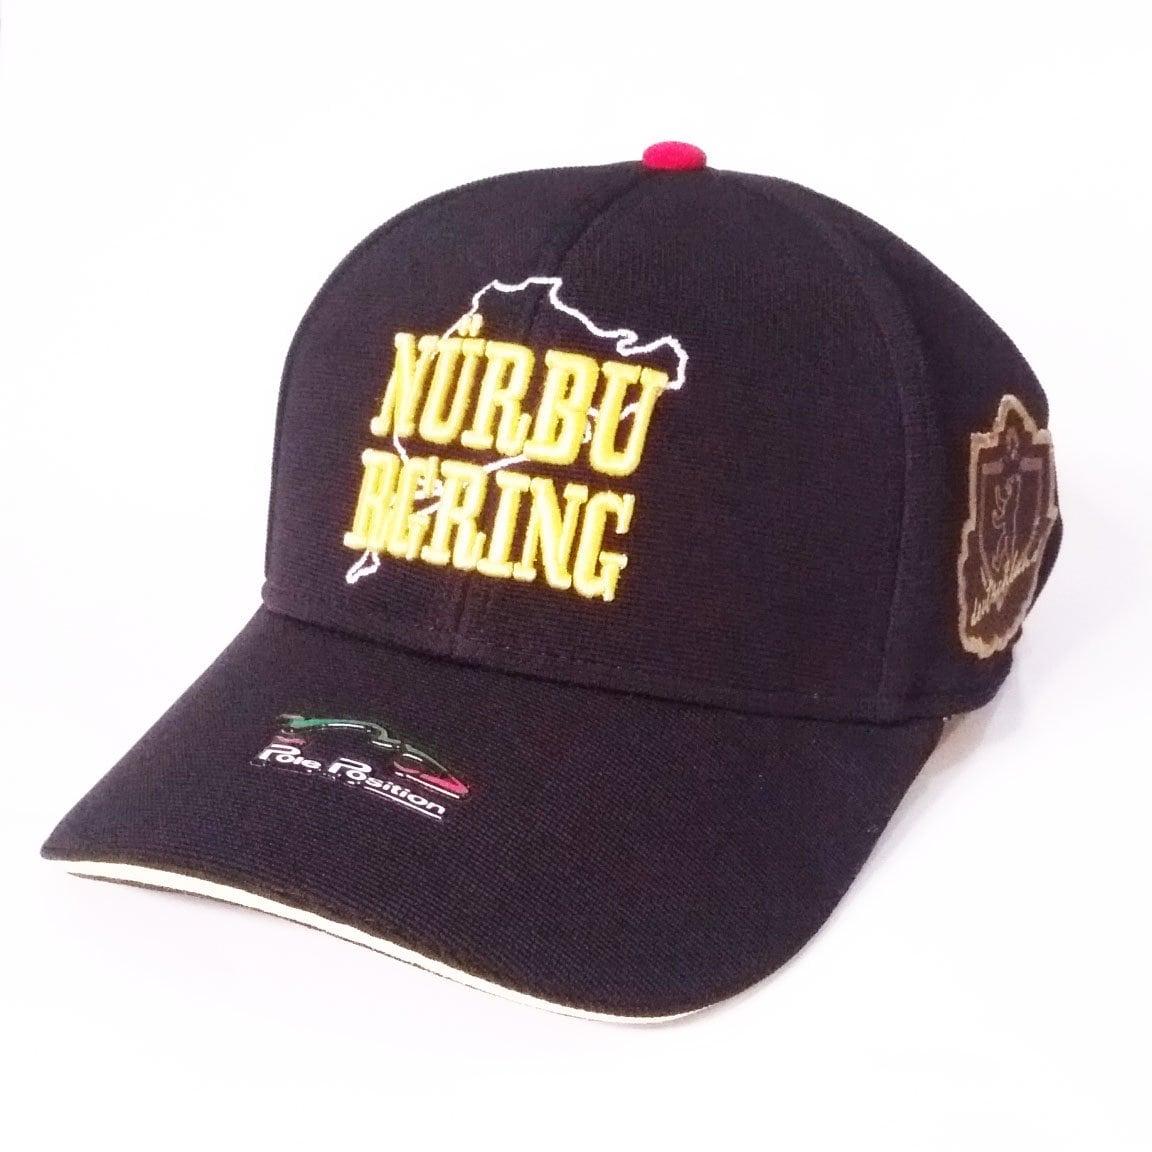 Gorra Racing 18 Nurburgring Pole Position